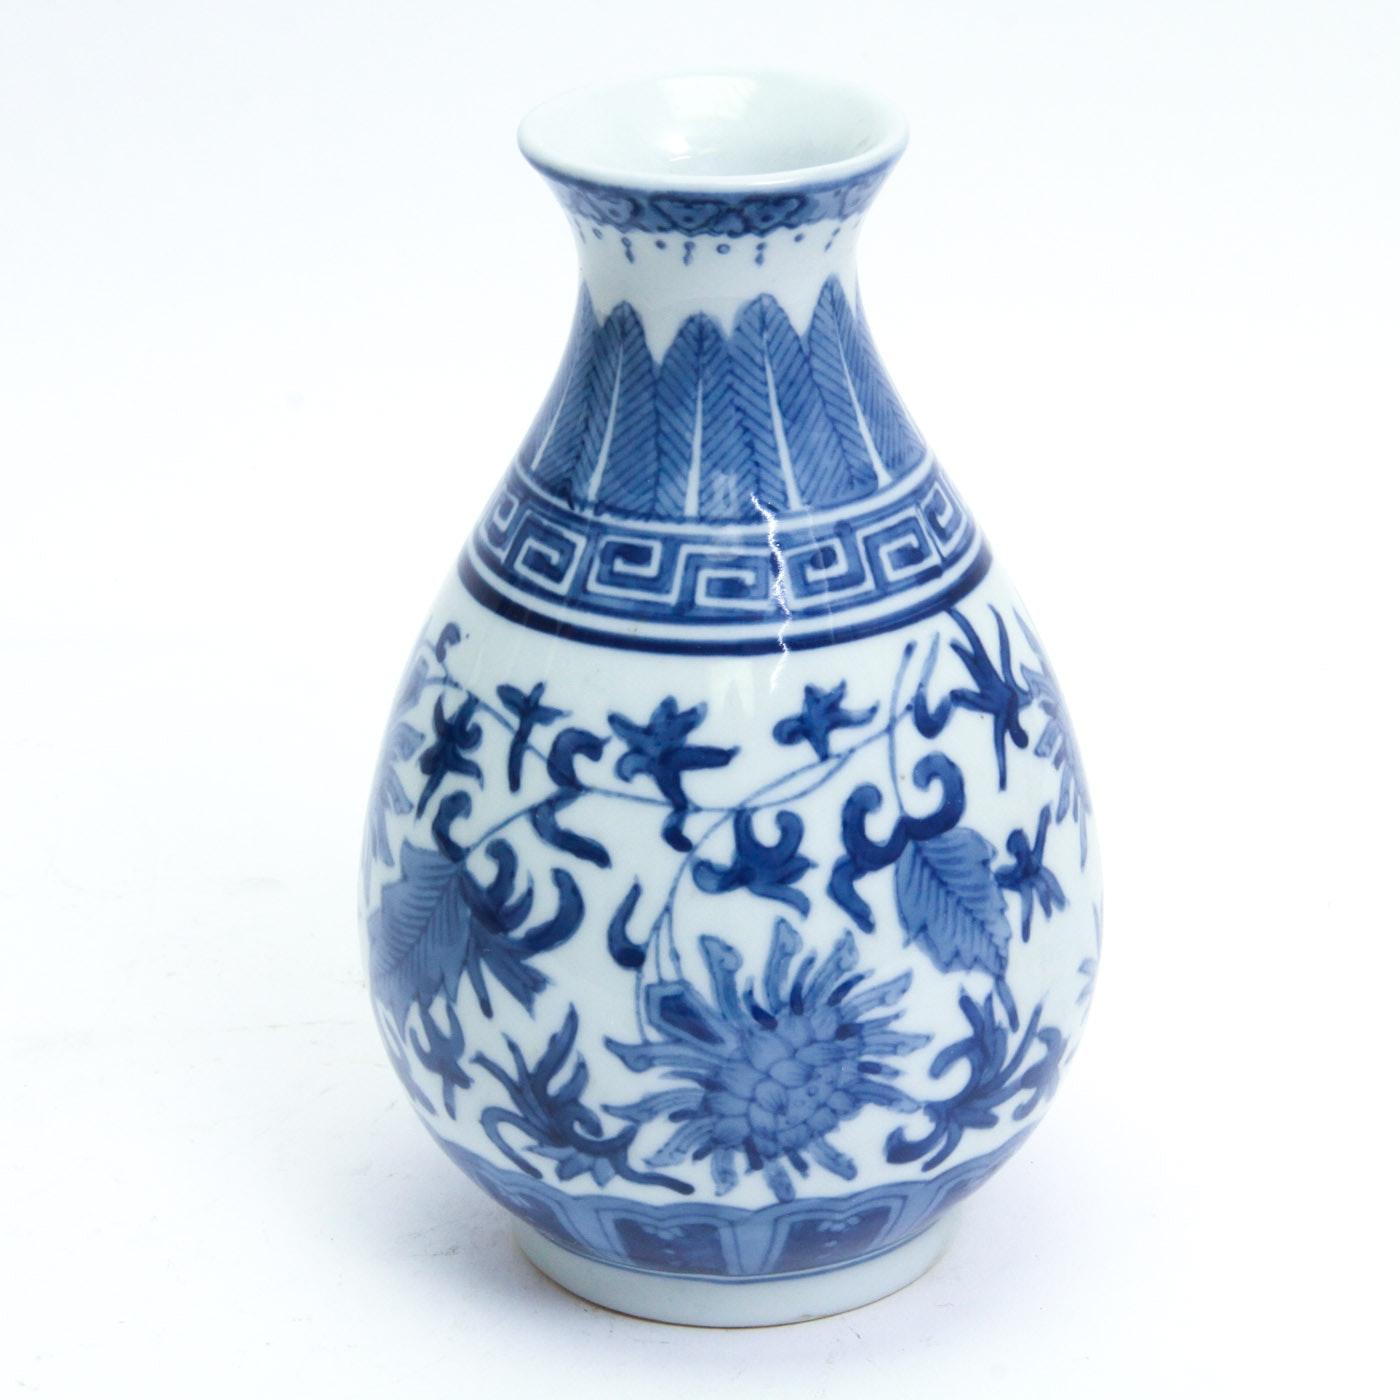 Chinese Style Blue and White Vase